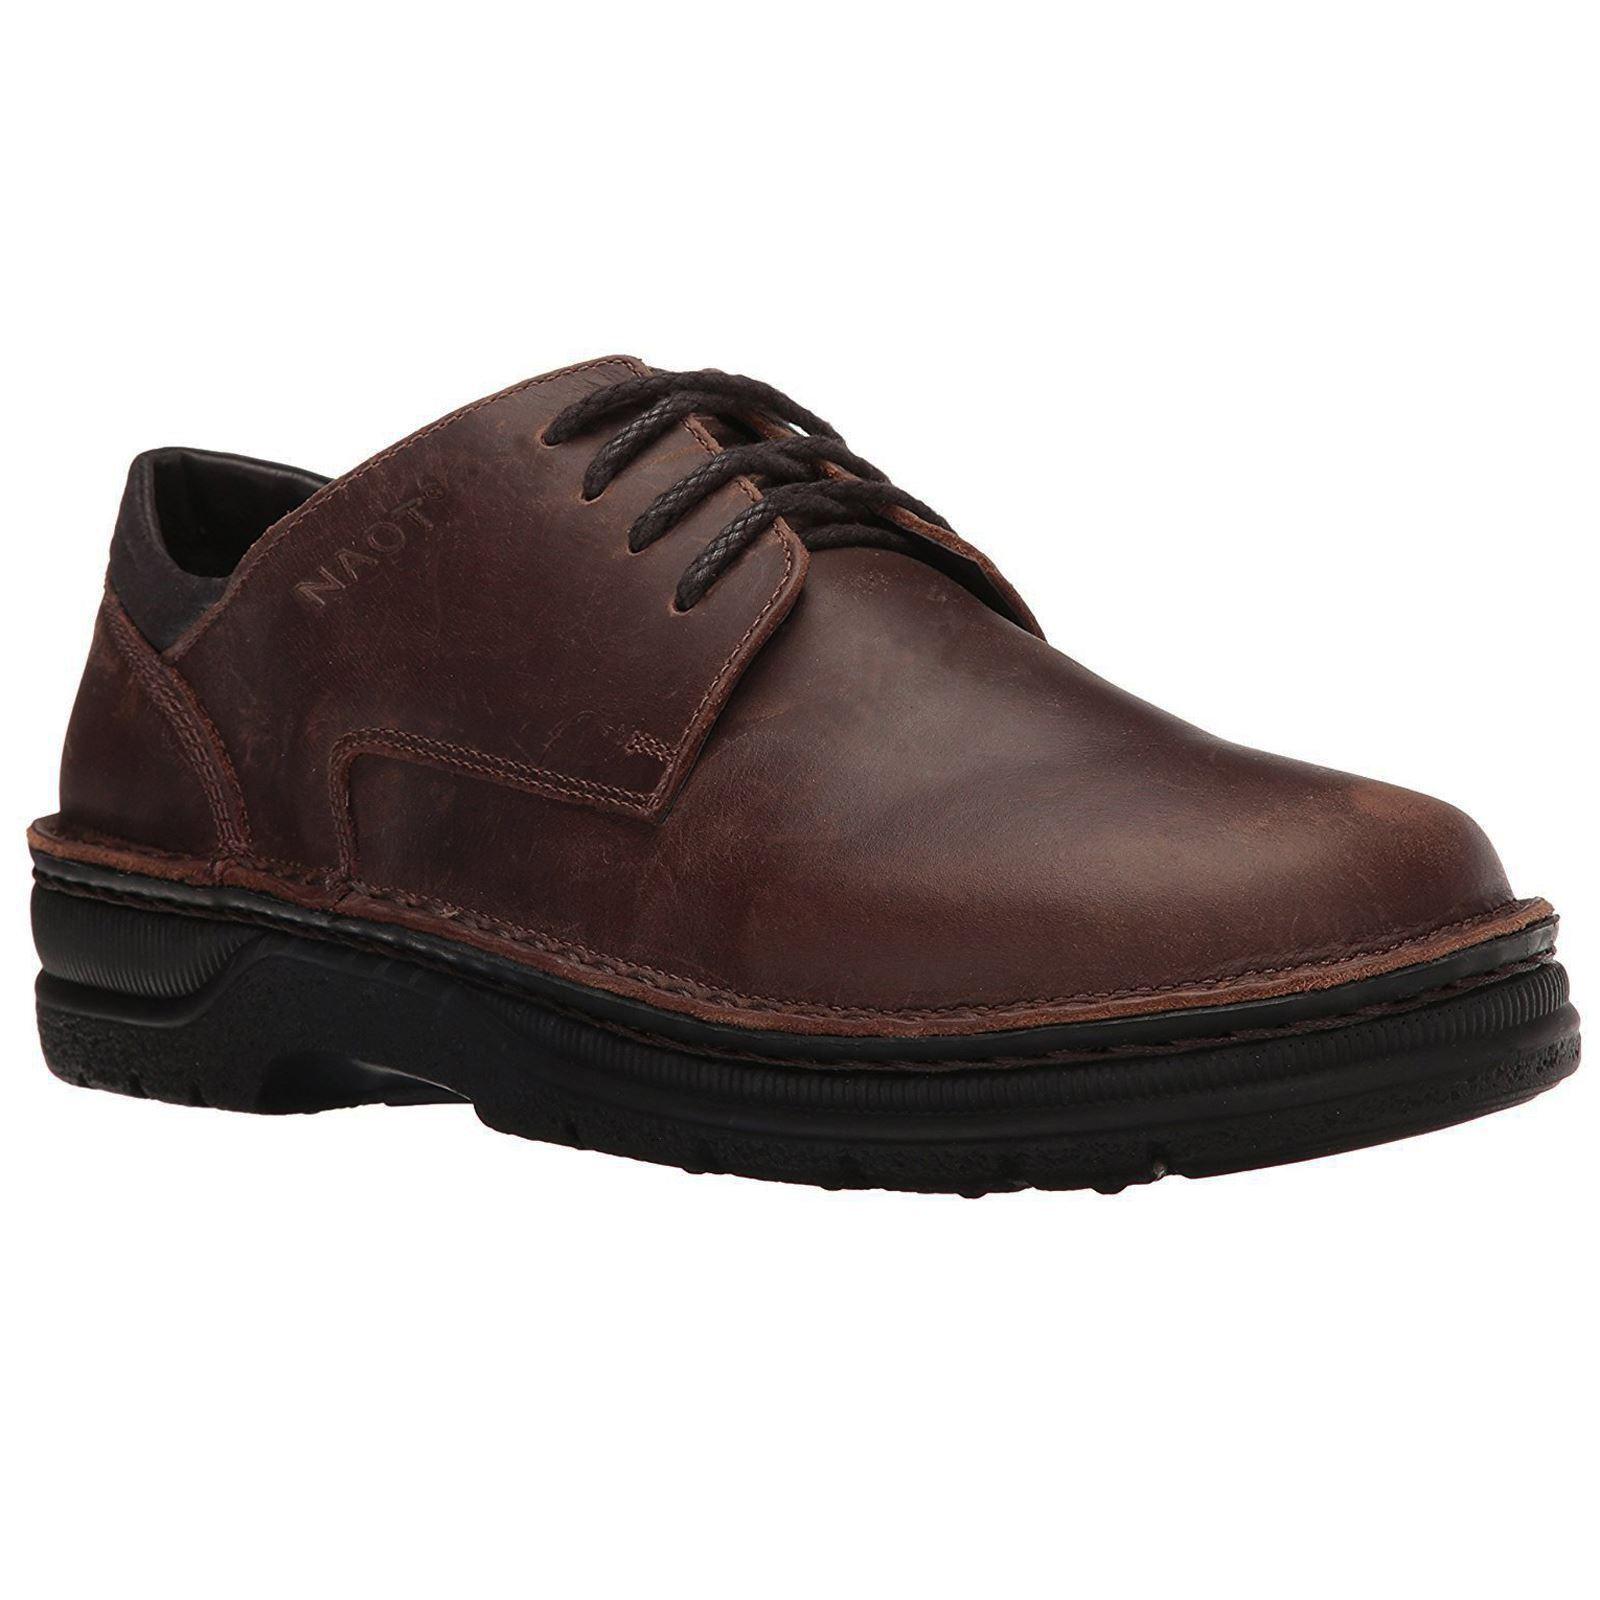 Naot Denali Crazy Horse Mens Leather Lace-up Sport Flats Elegant Oxford Shoes